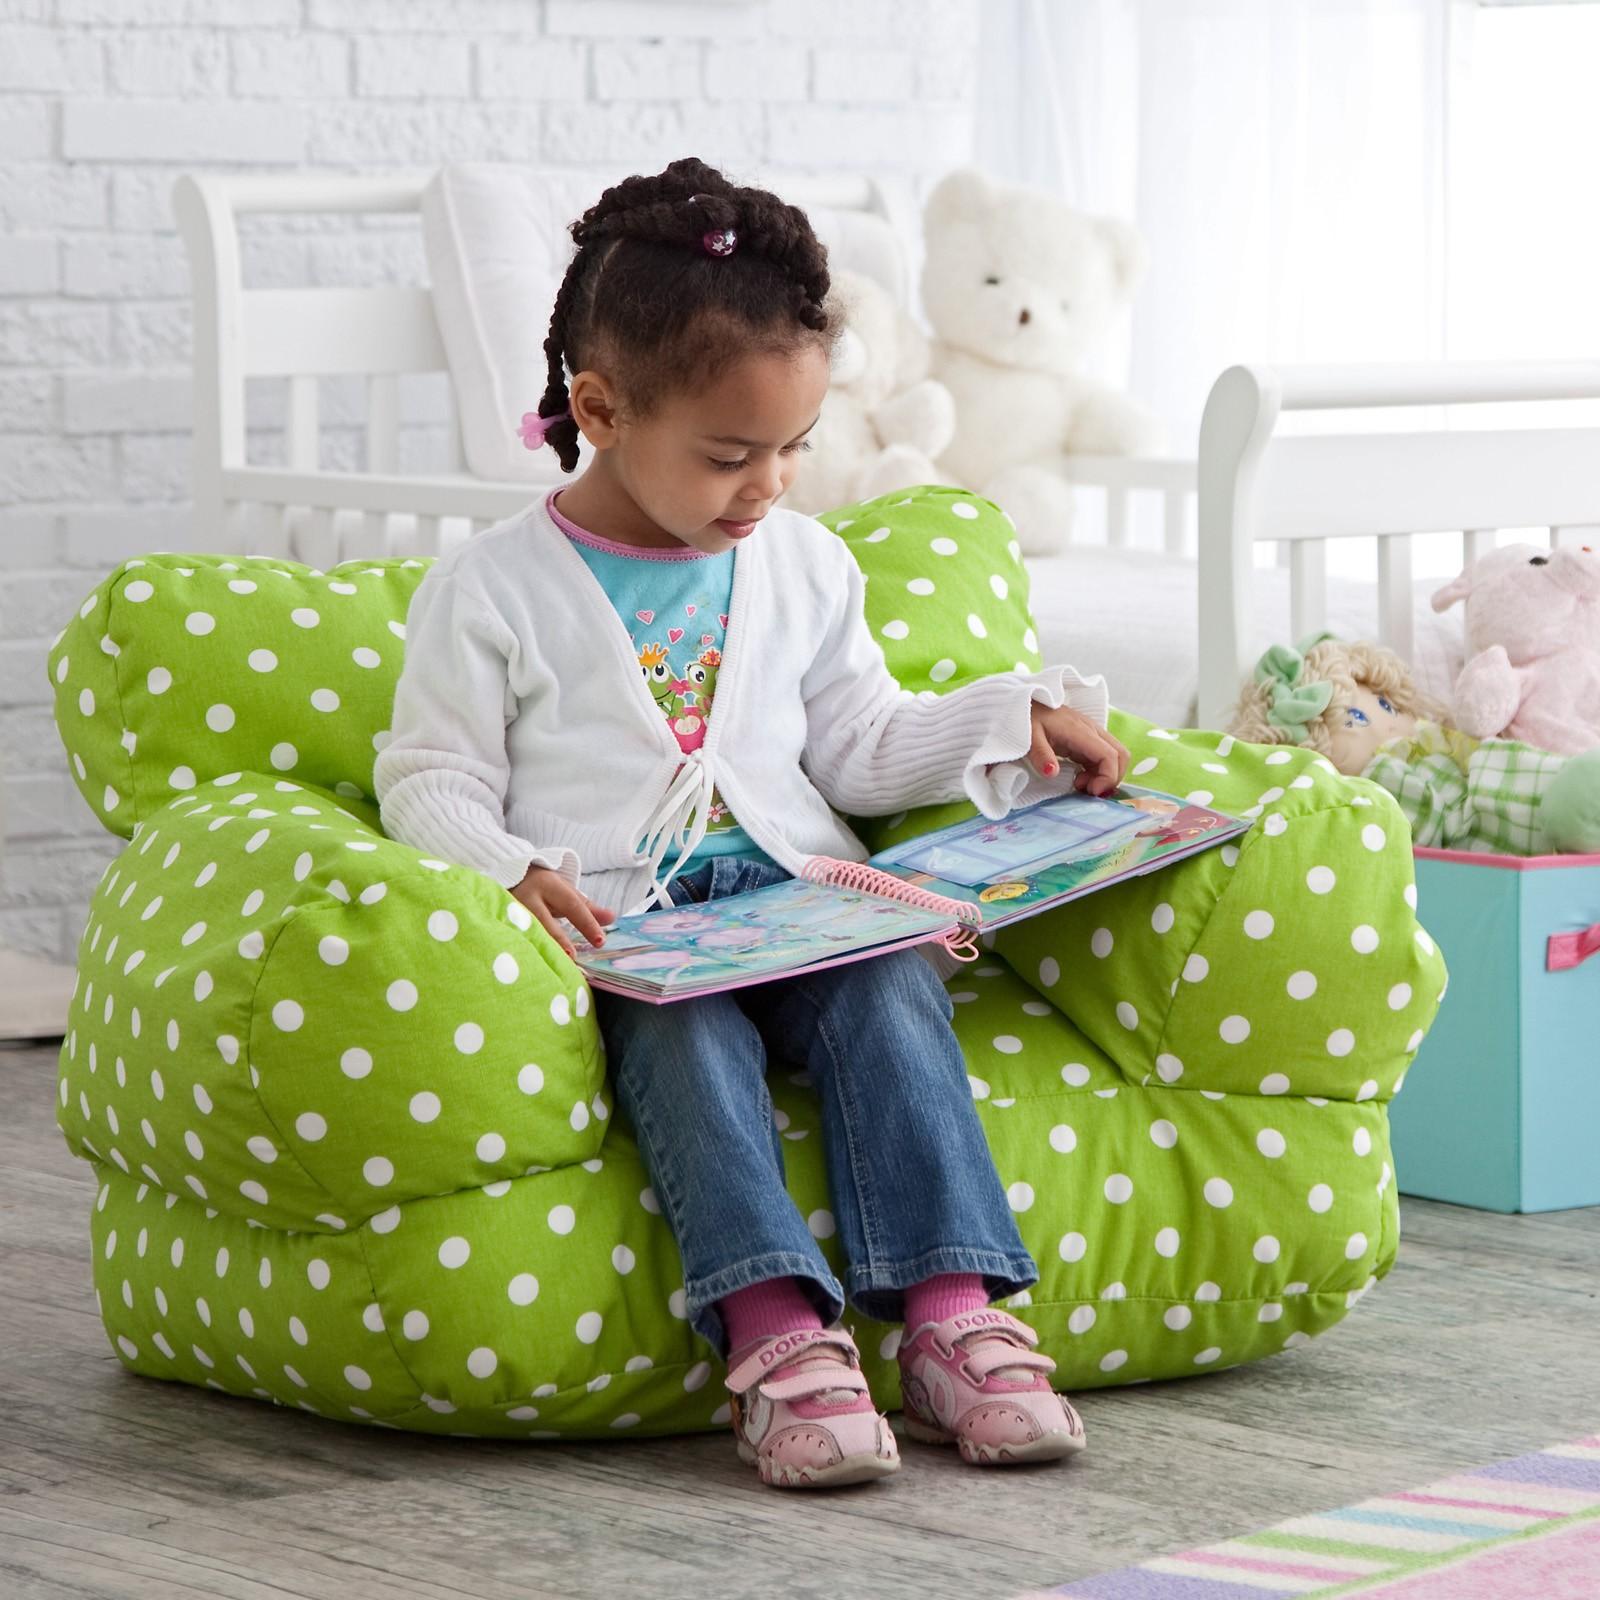 green bean bag chair high floor mat eco friendly chairs ideas on foter twill polka dot mi kids